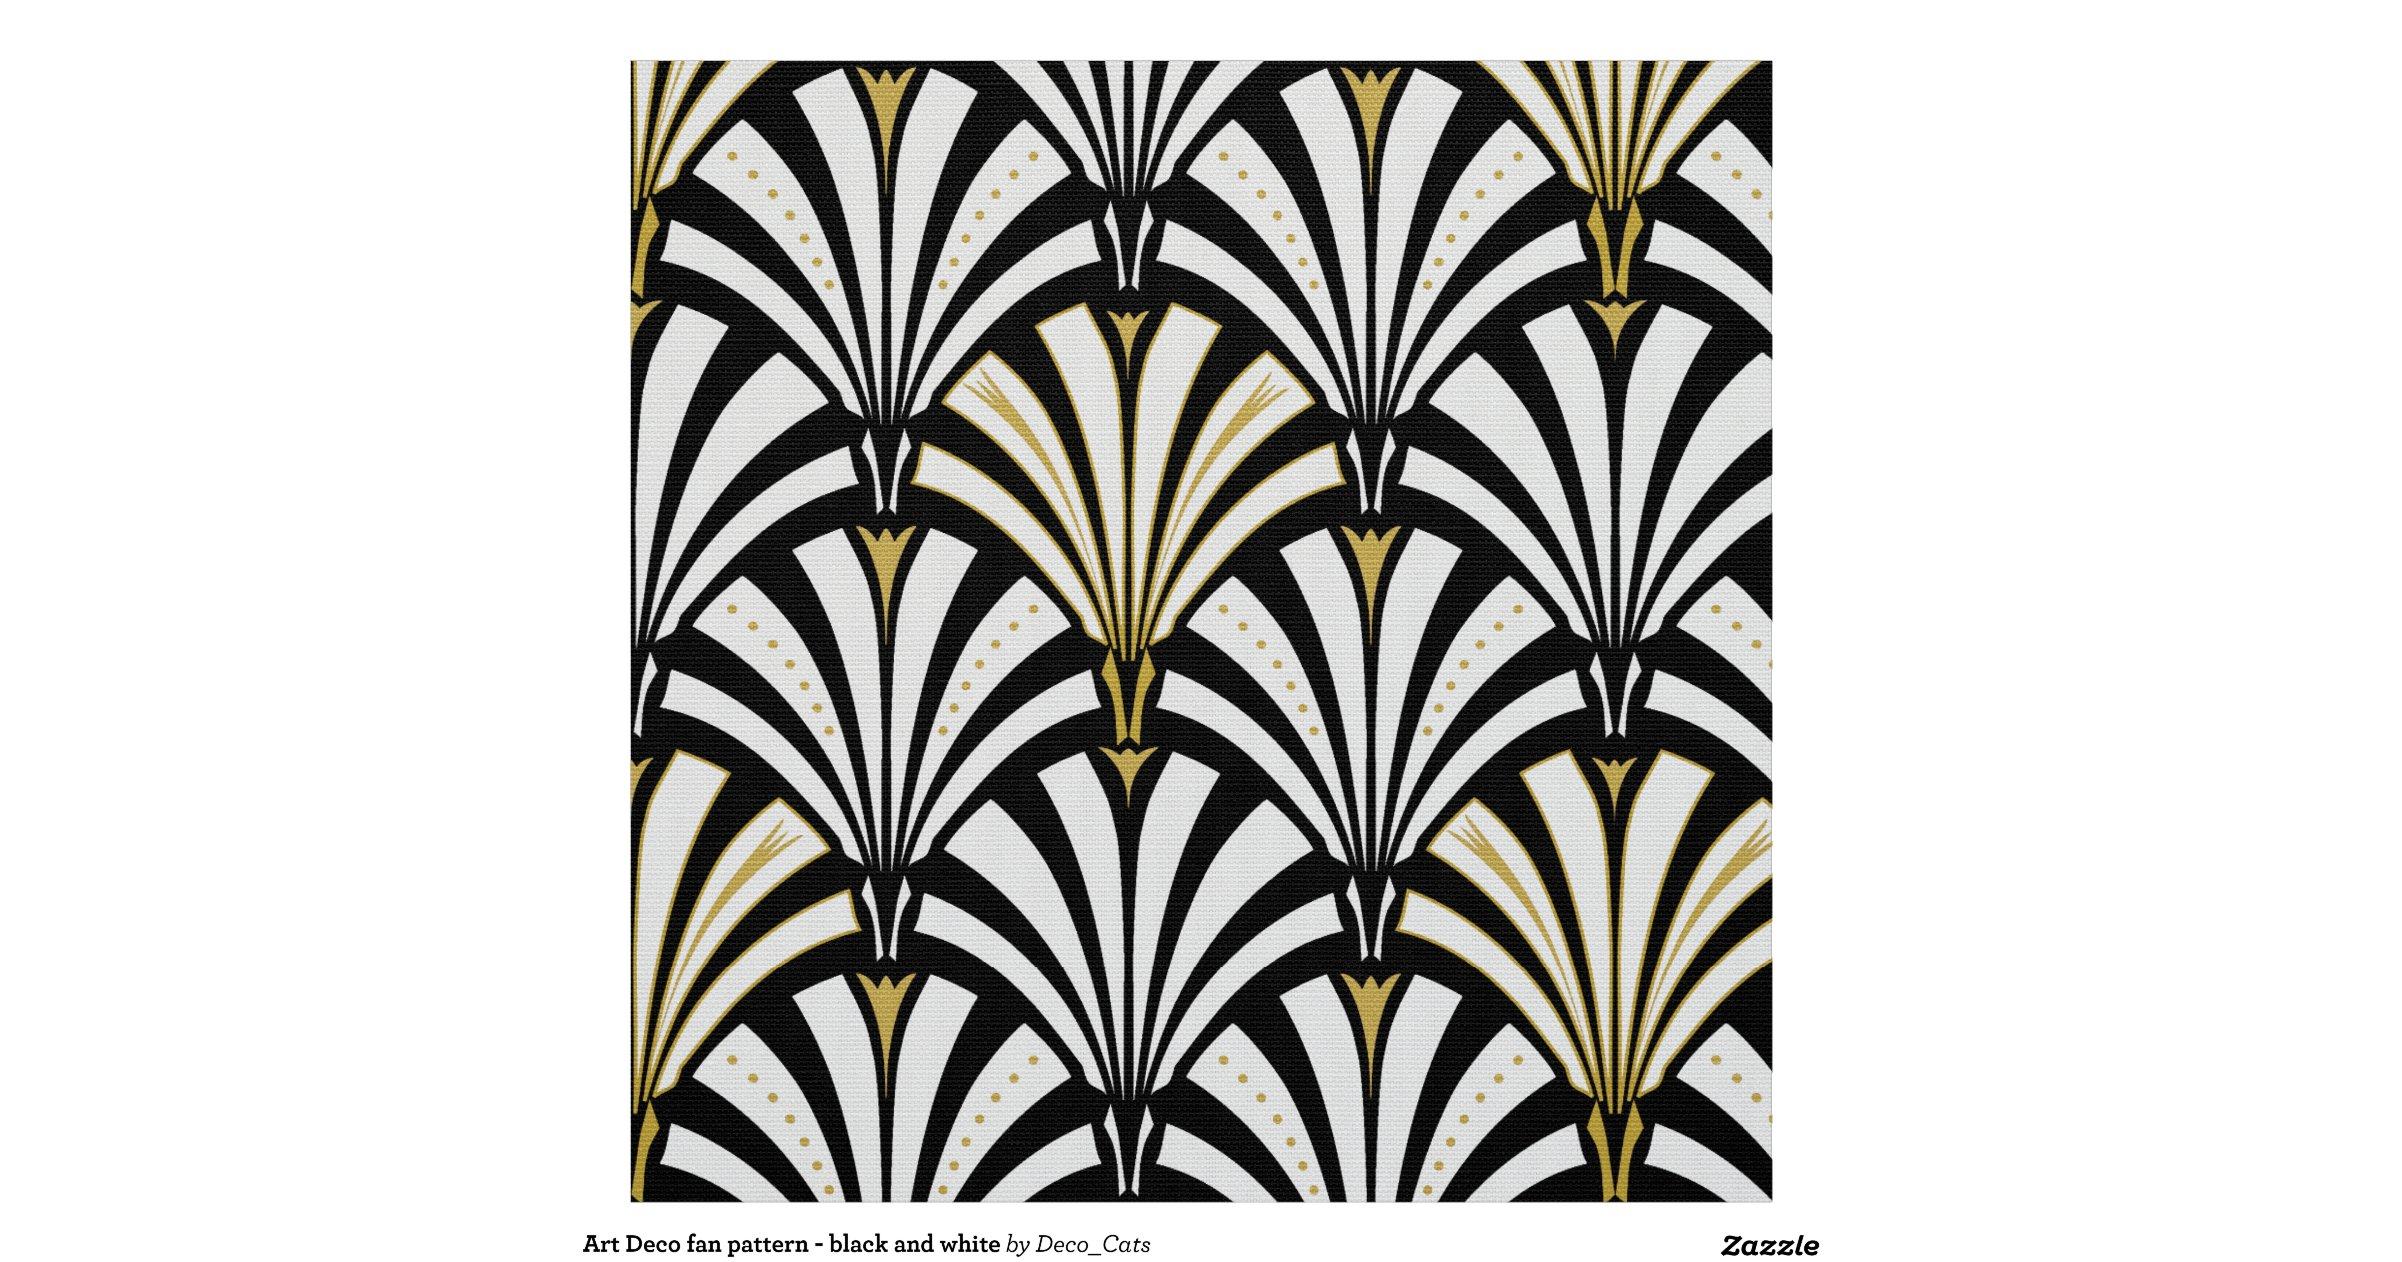 Artdecofanpatternblackandwhitefabric